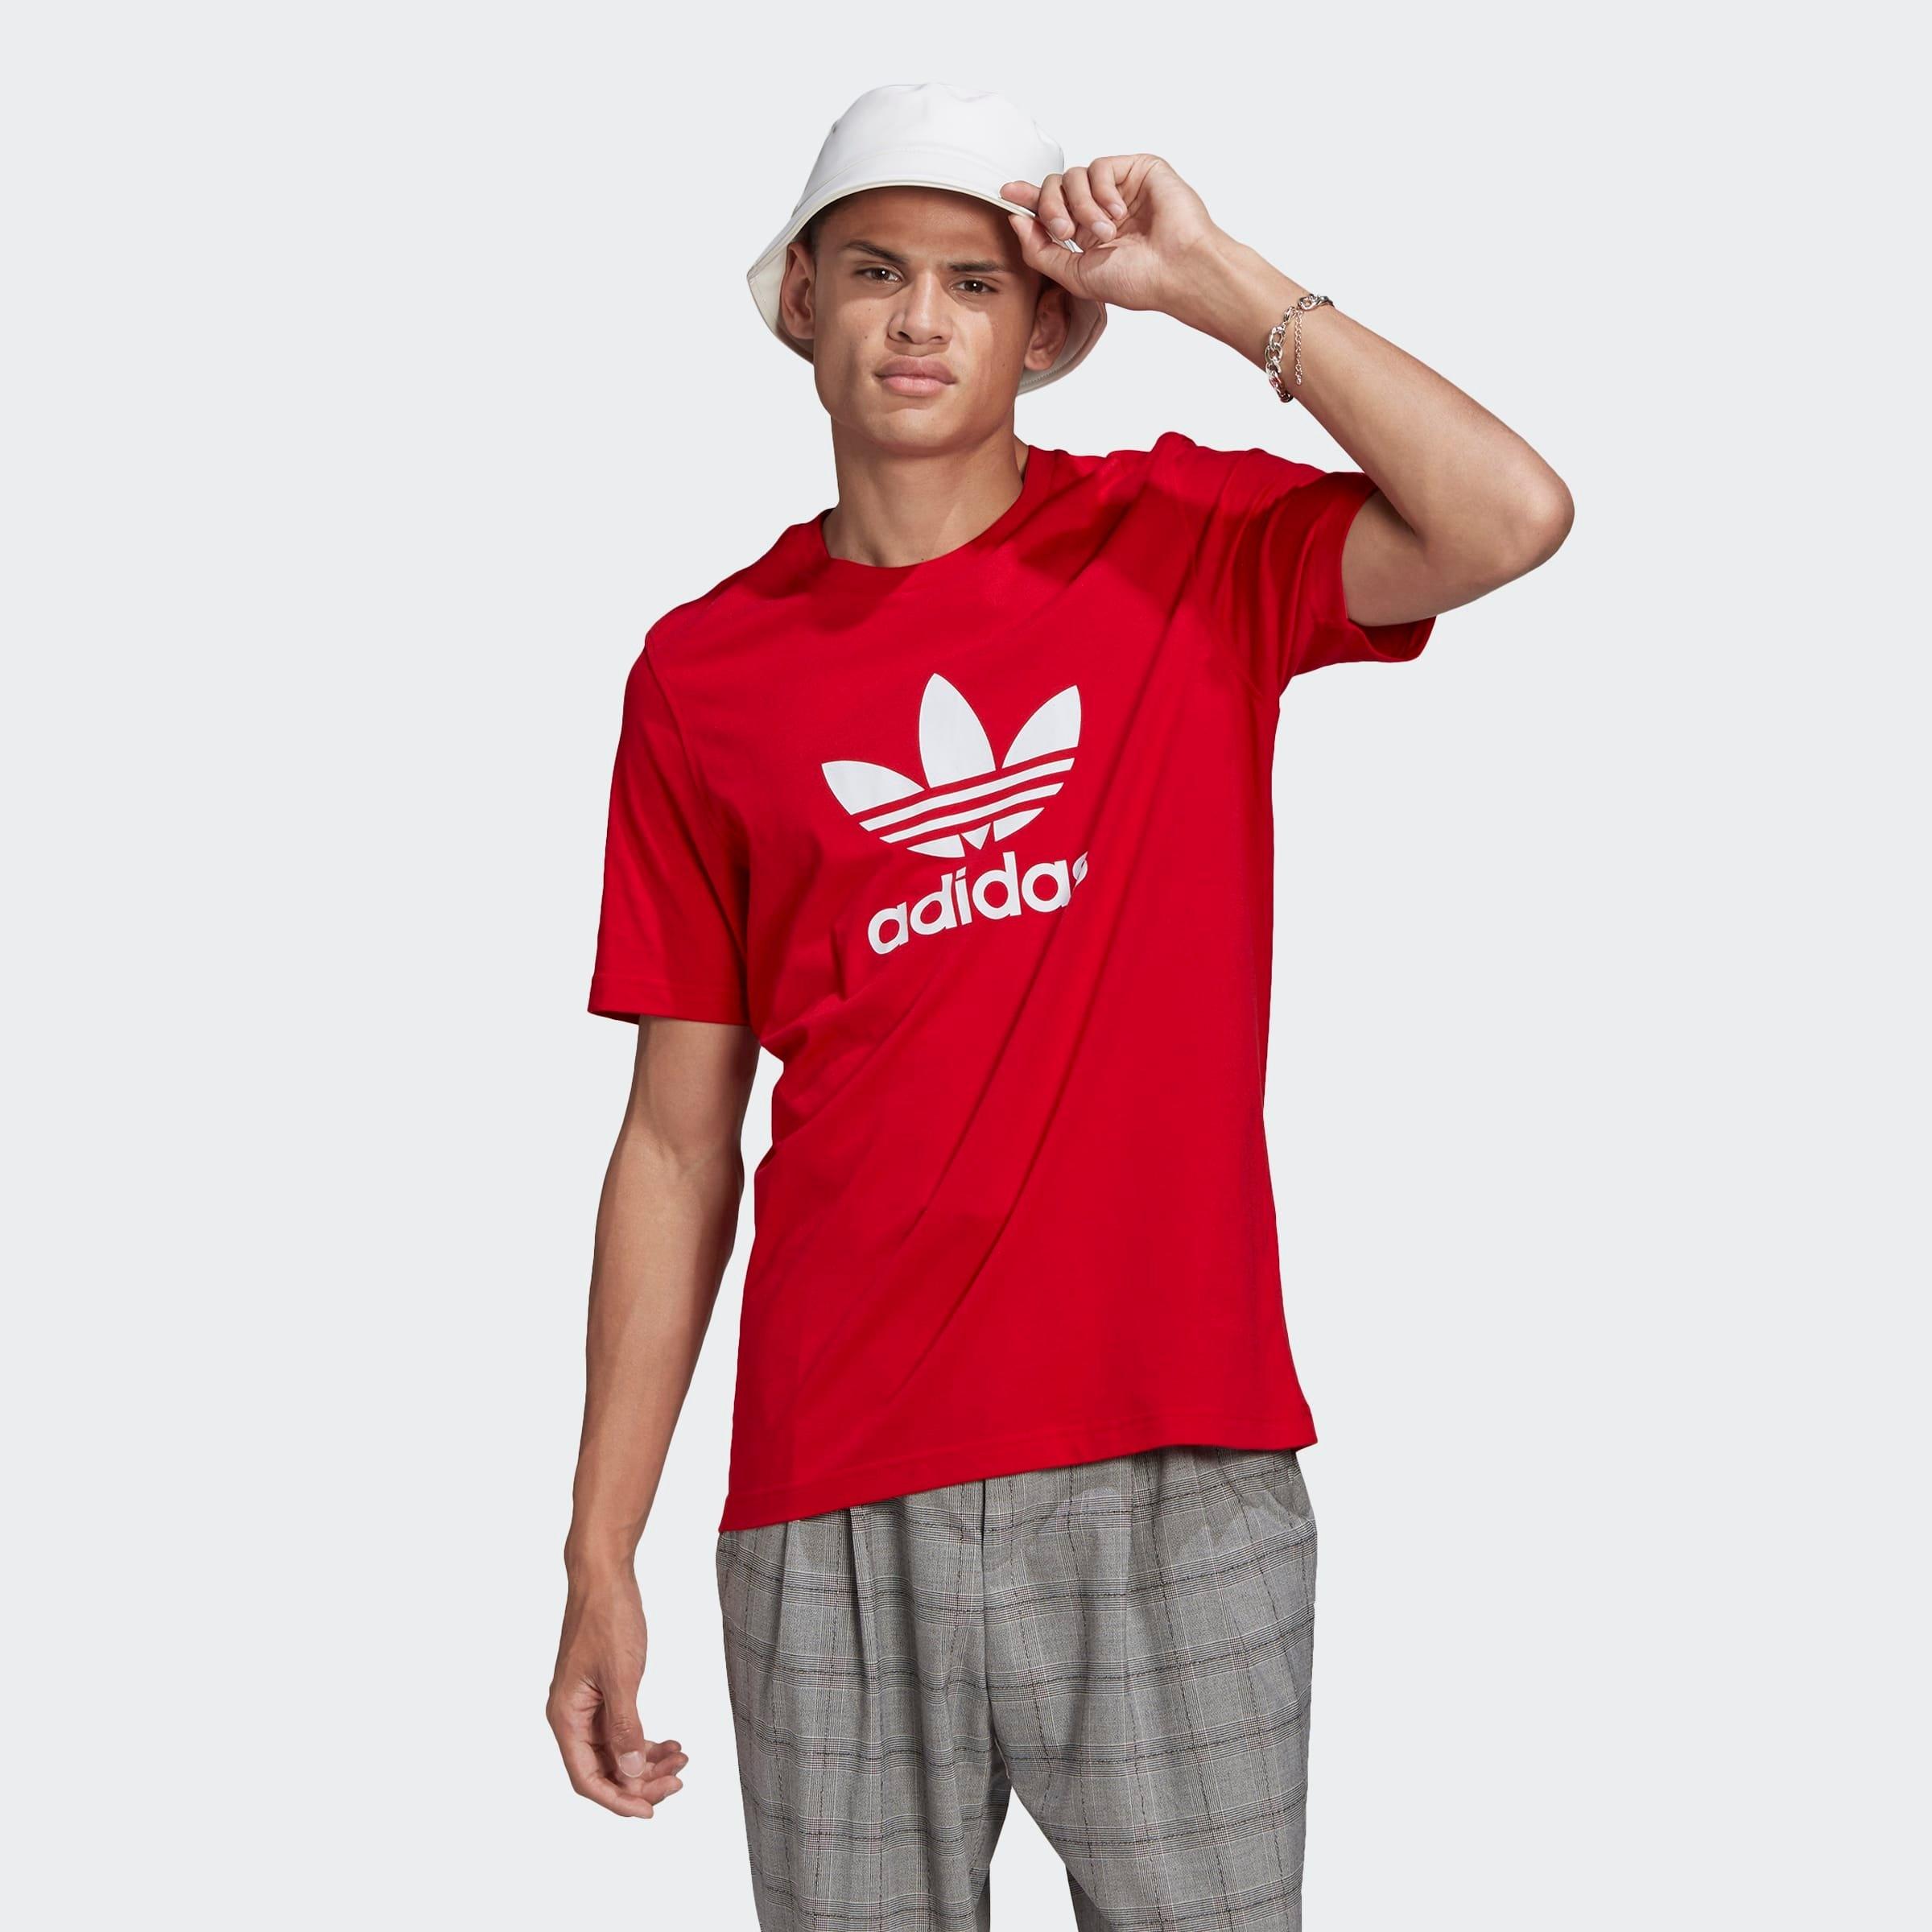 adidas Originals T-shirt »TREFOIL T-SHIRT« nu online kopen bij OTTO